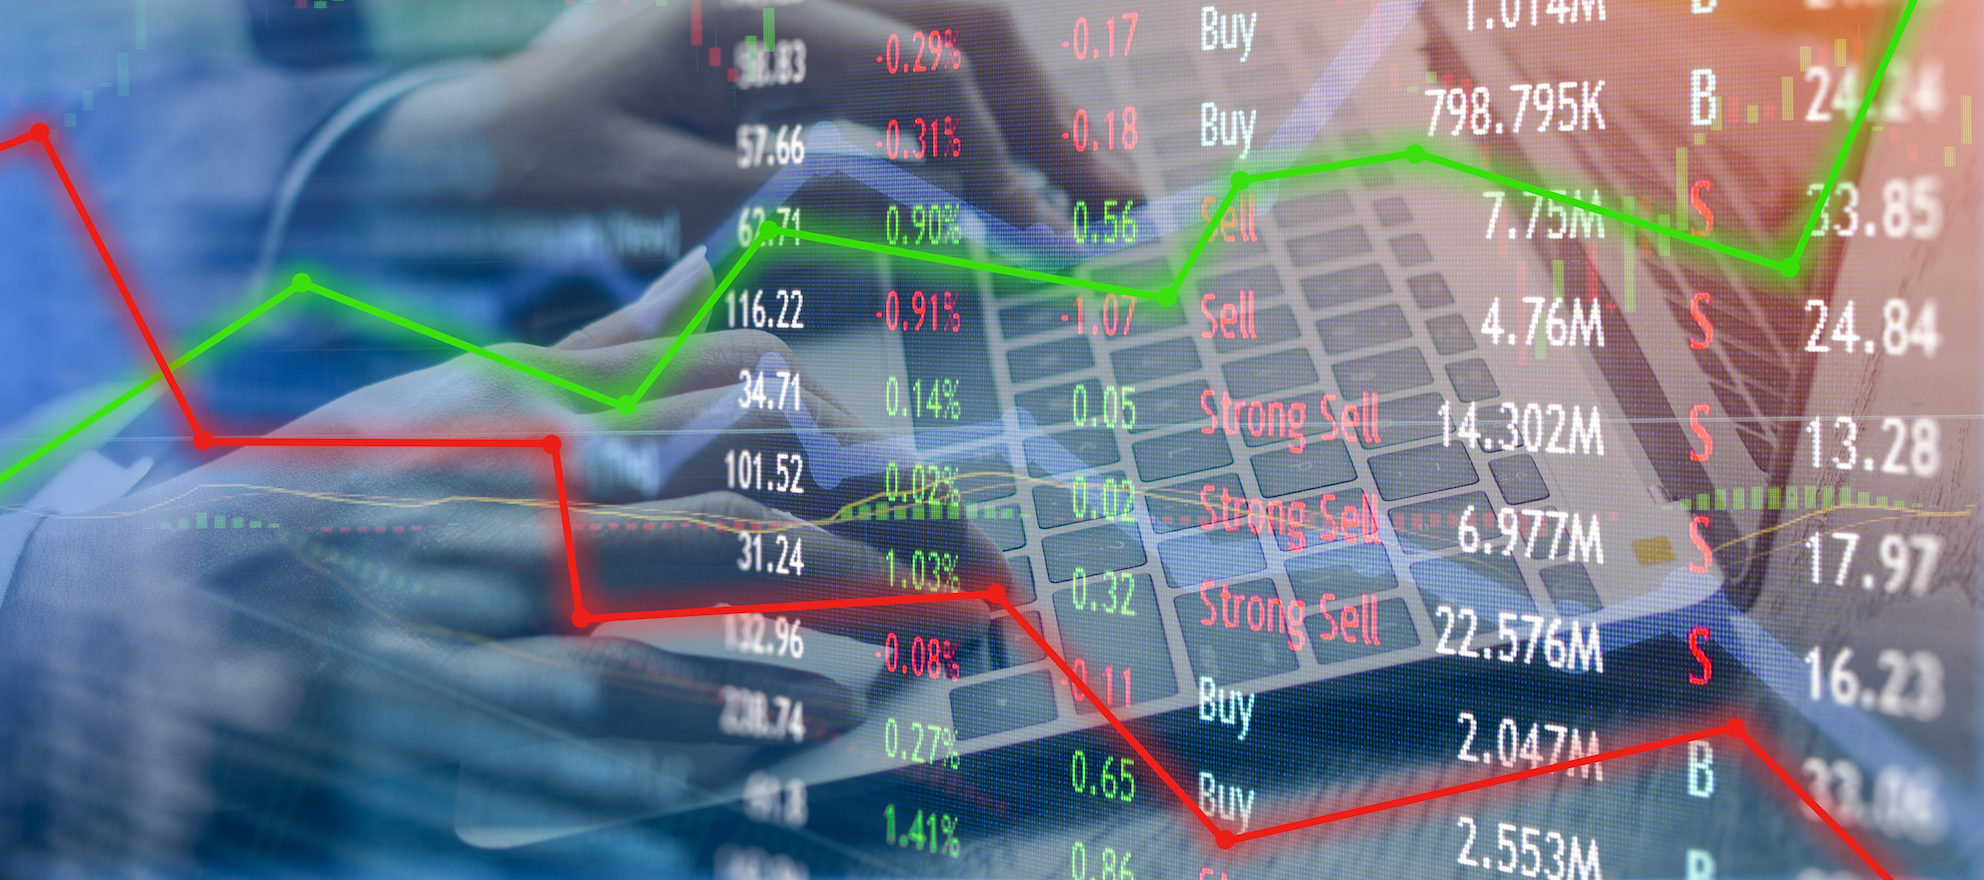 Douglas Elliman profits collapse amid slower real estate market